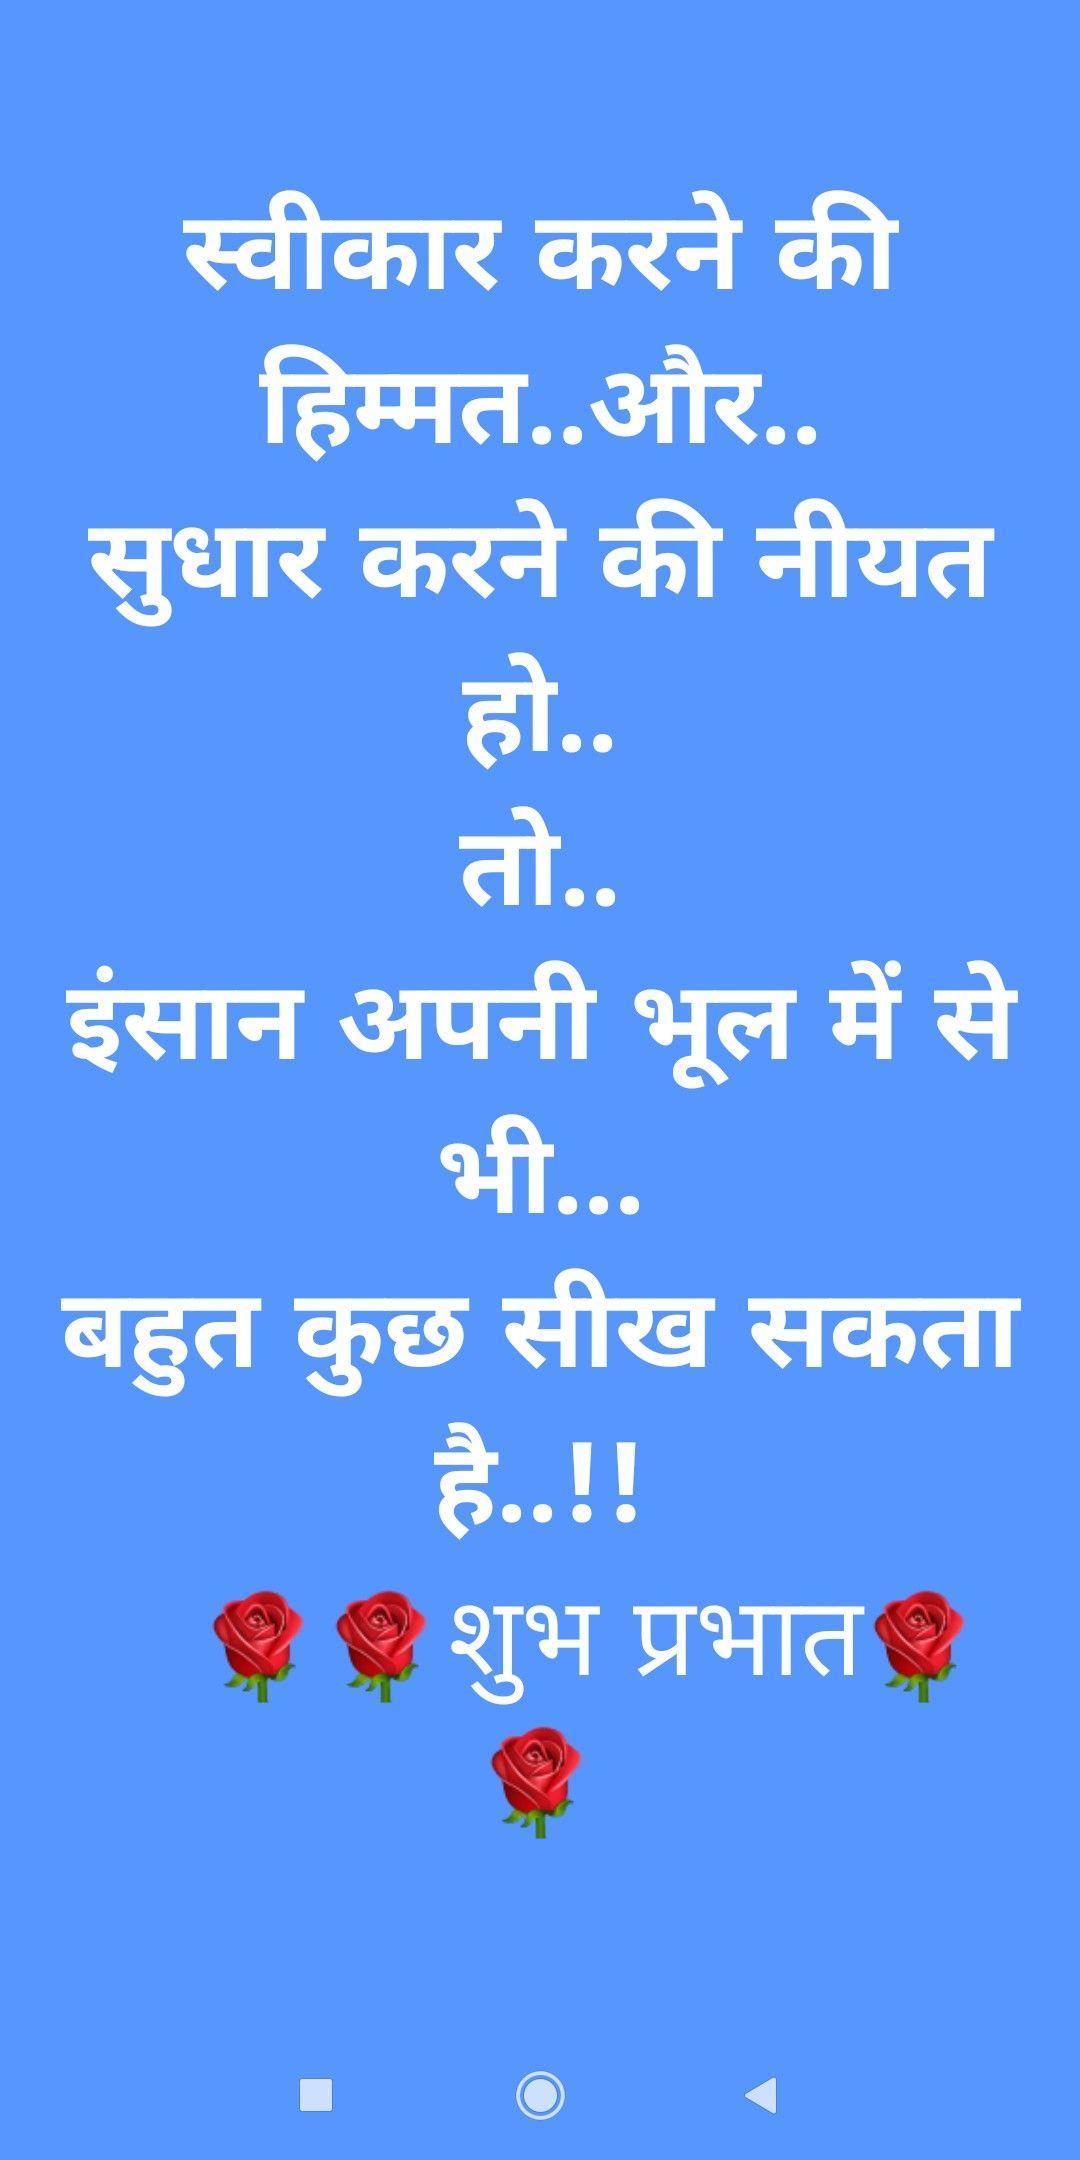 pin🐿sharma🐿 on good morningsharma   hindi quotes on